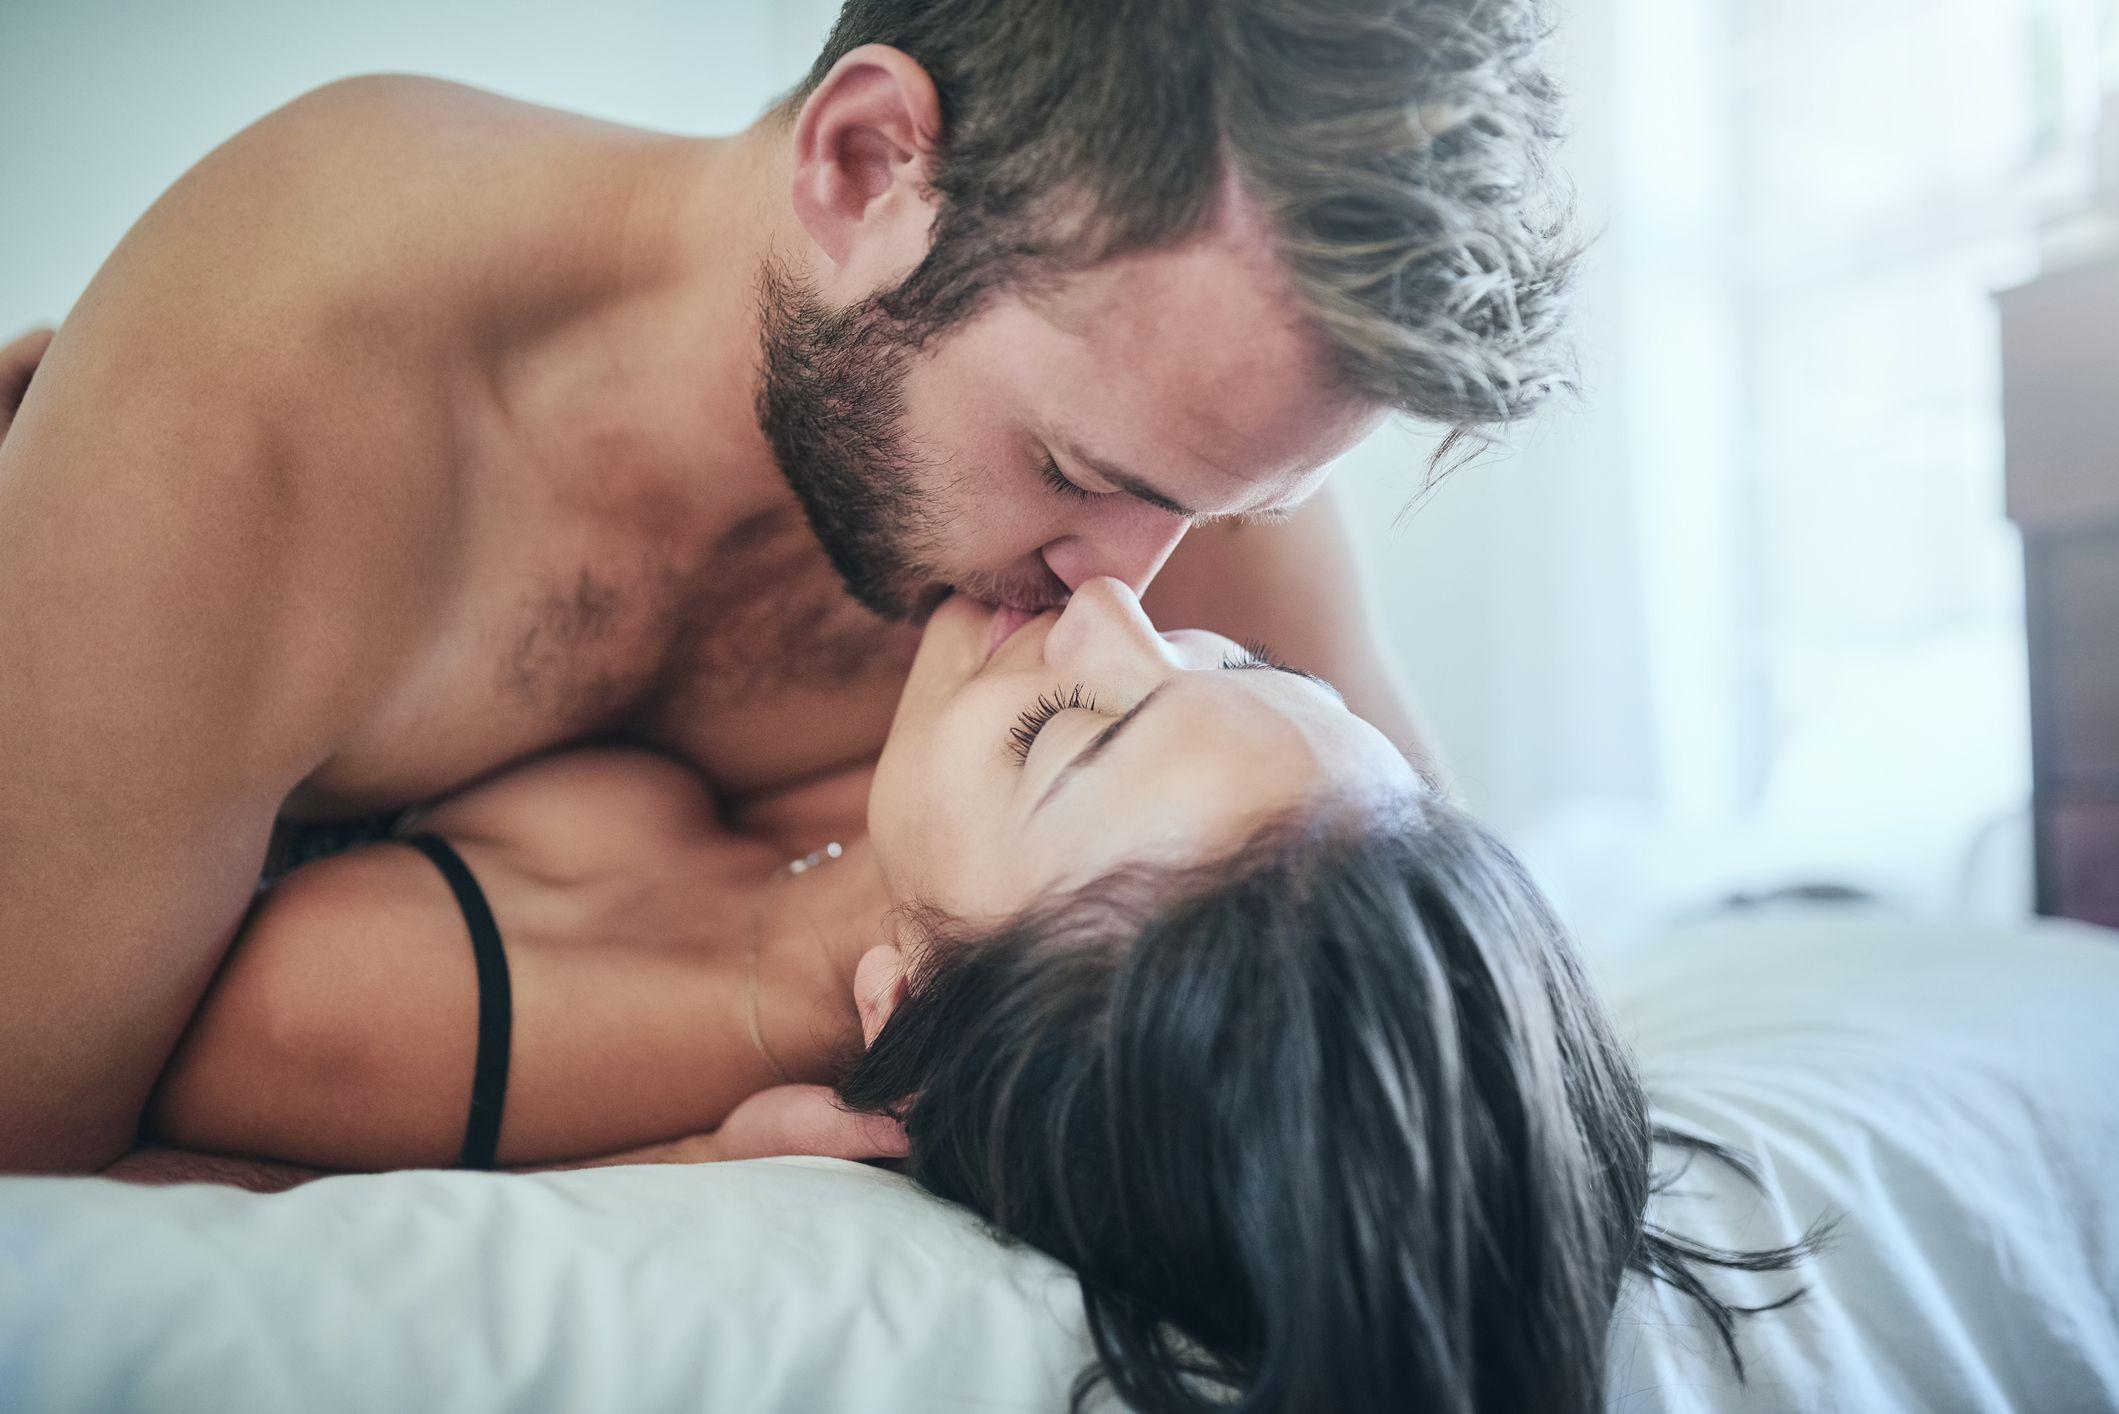 Male to male sex pics